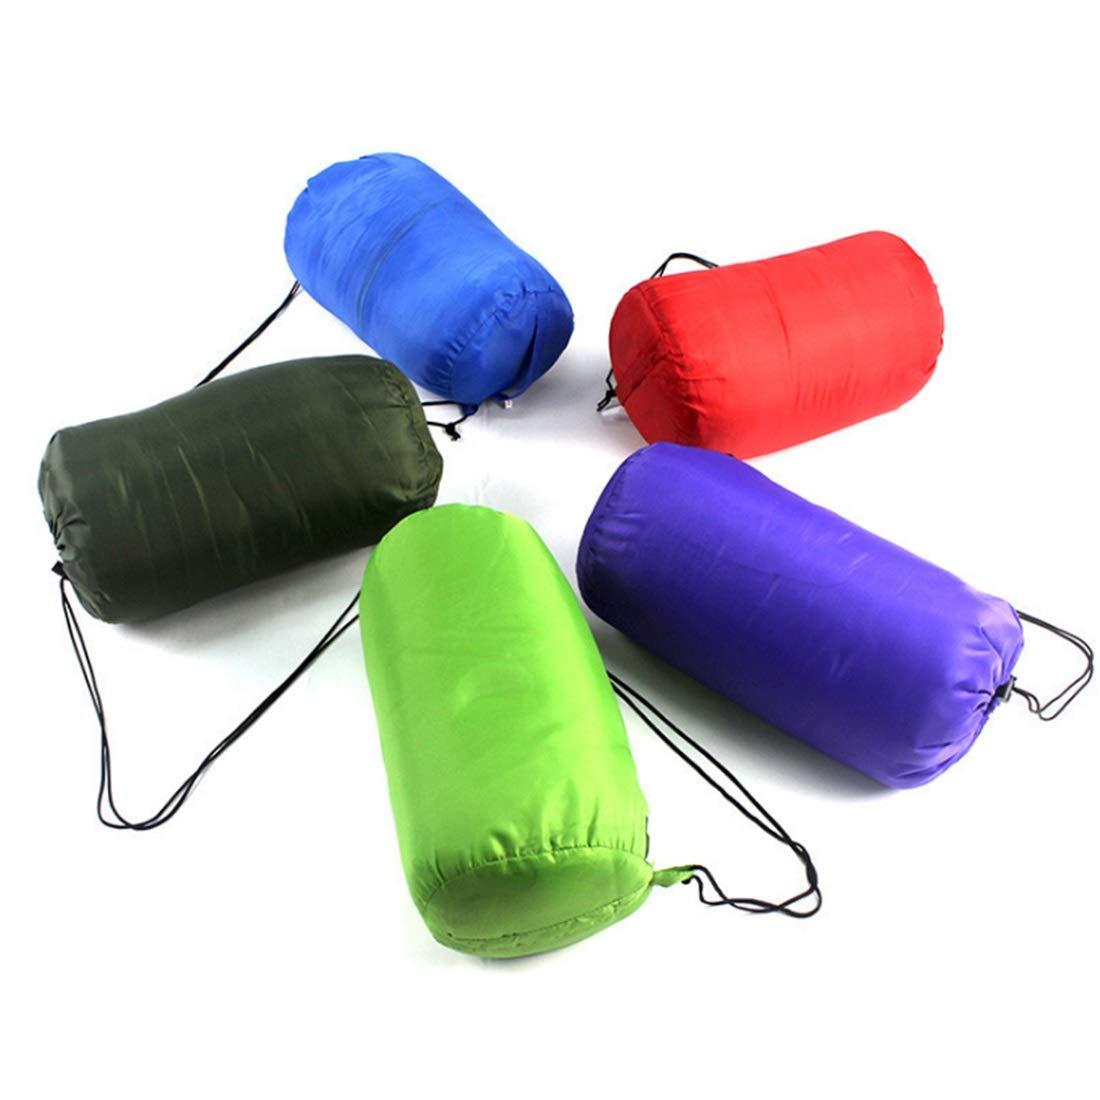 Xasclnis Camping Schlafsack ideal ideal ideal für 3 Saison - Herbst, Sommer, Frühling (Farbe   lila, Größe   1300g) B07L2WDTJV Schlafscke Günstigstes 1133b8